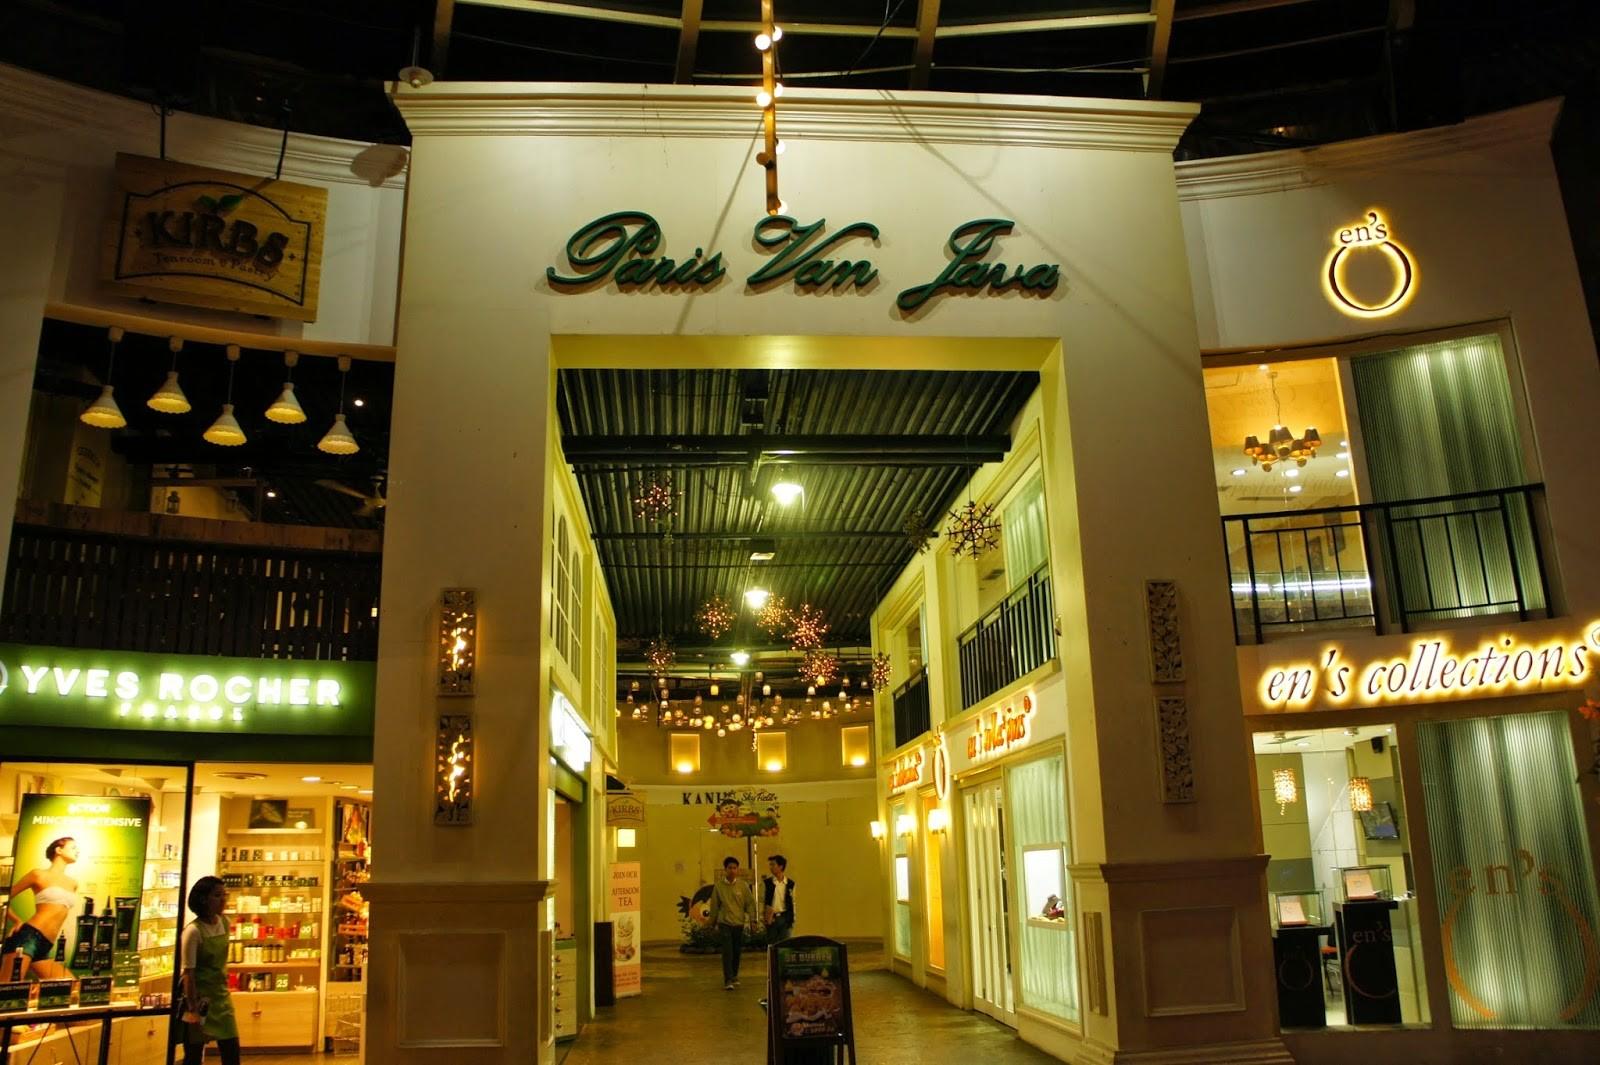 Paris Van Java Mall di Bandung